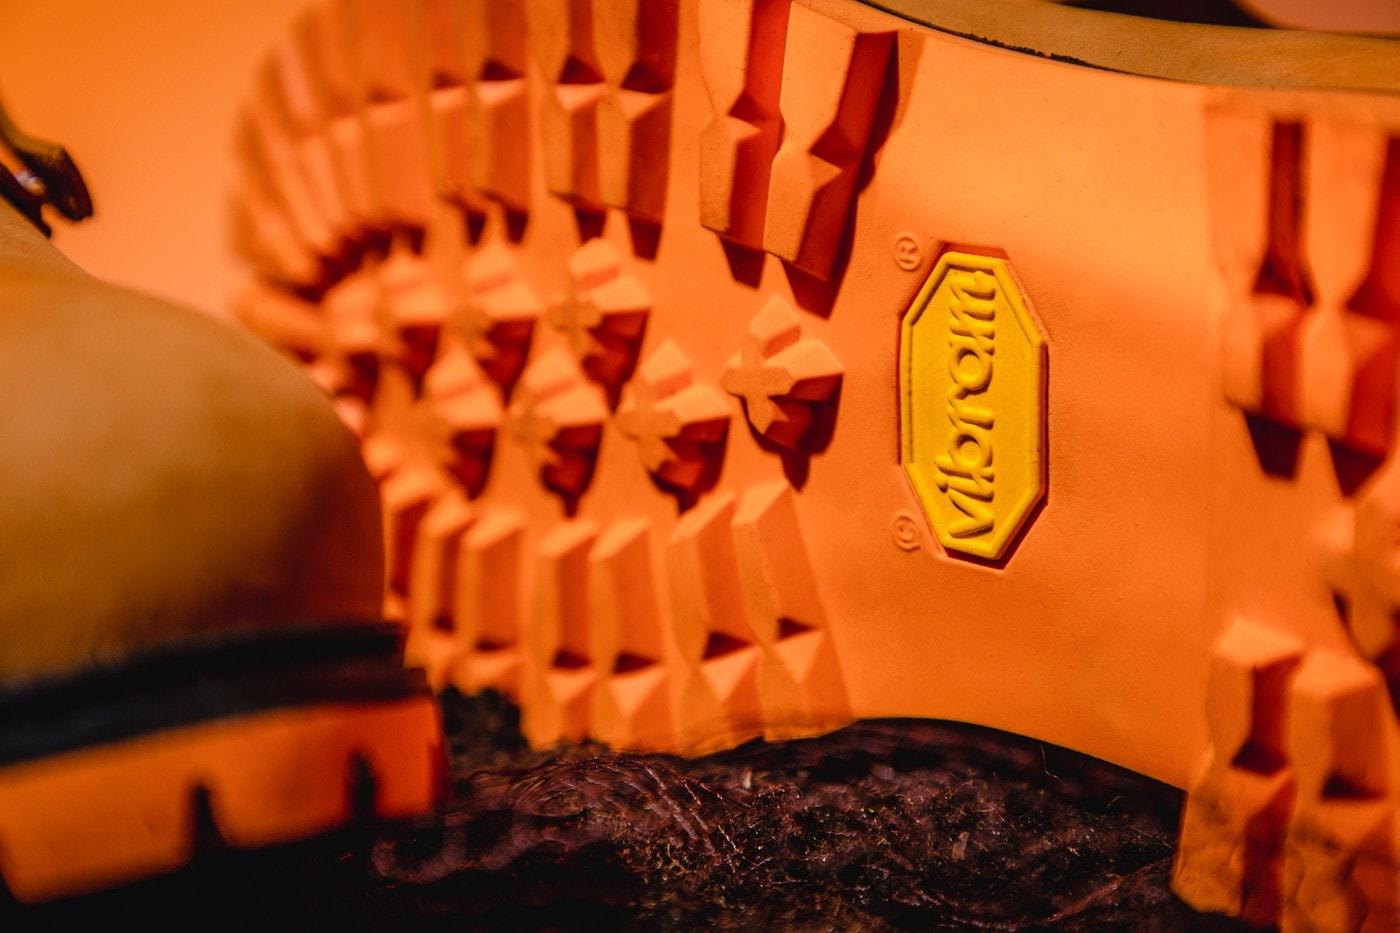 KAWS:HOLIDAY 全新限定單品及 GOLF WANG x Lacoste 等本週不容錯過的 10 項新品發售